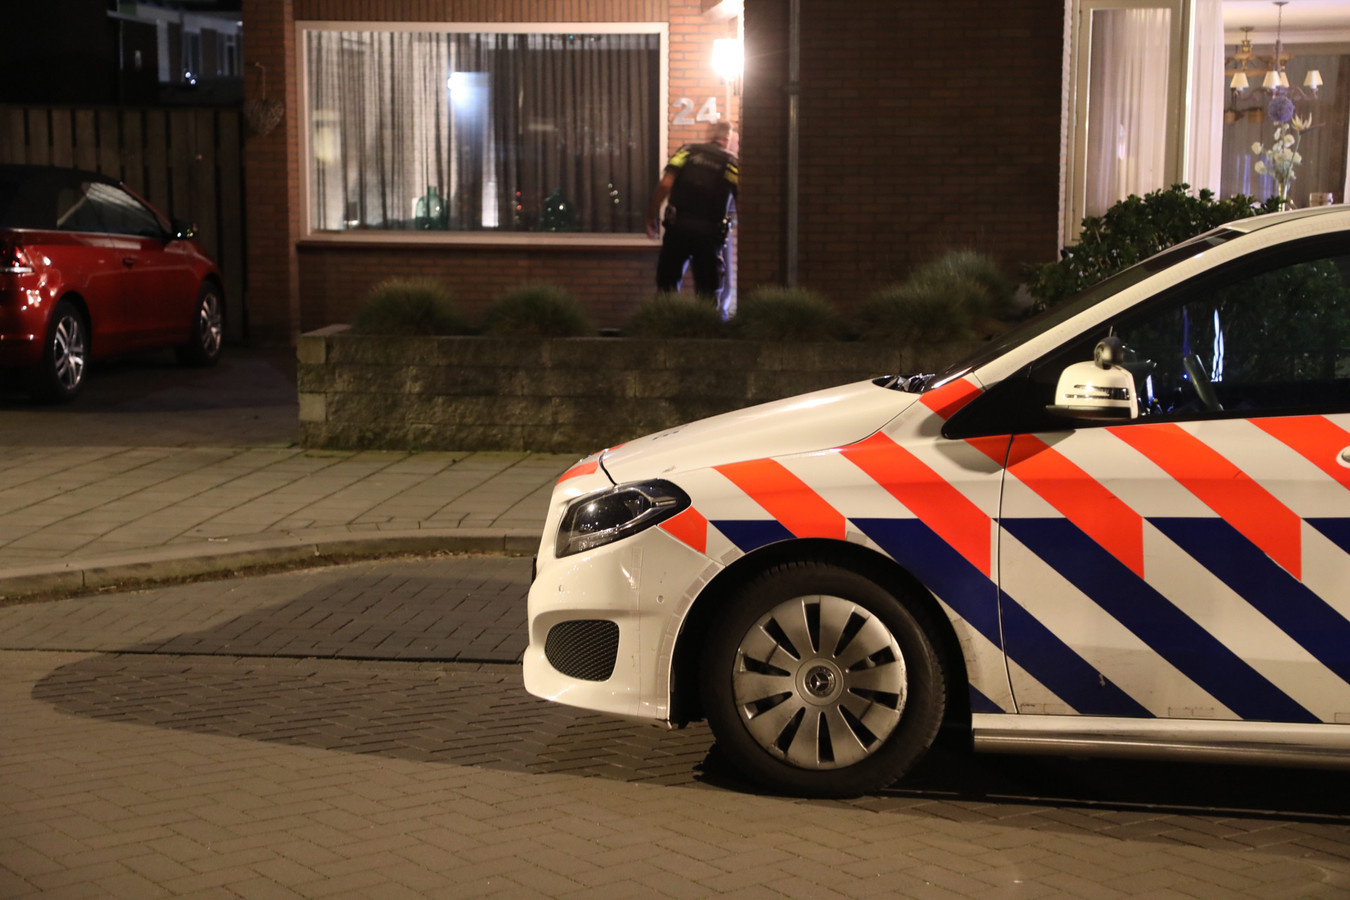 Overval in de Hertog Hendrik I Straat in Oss.